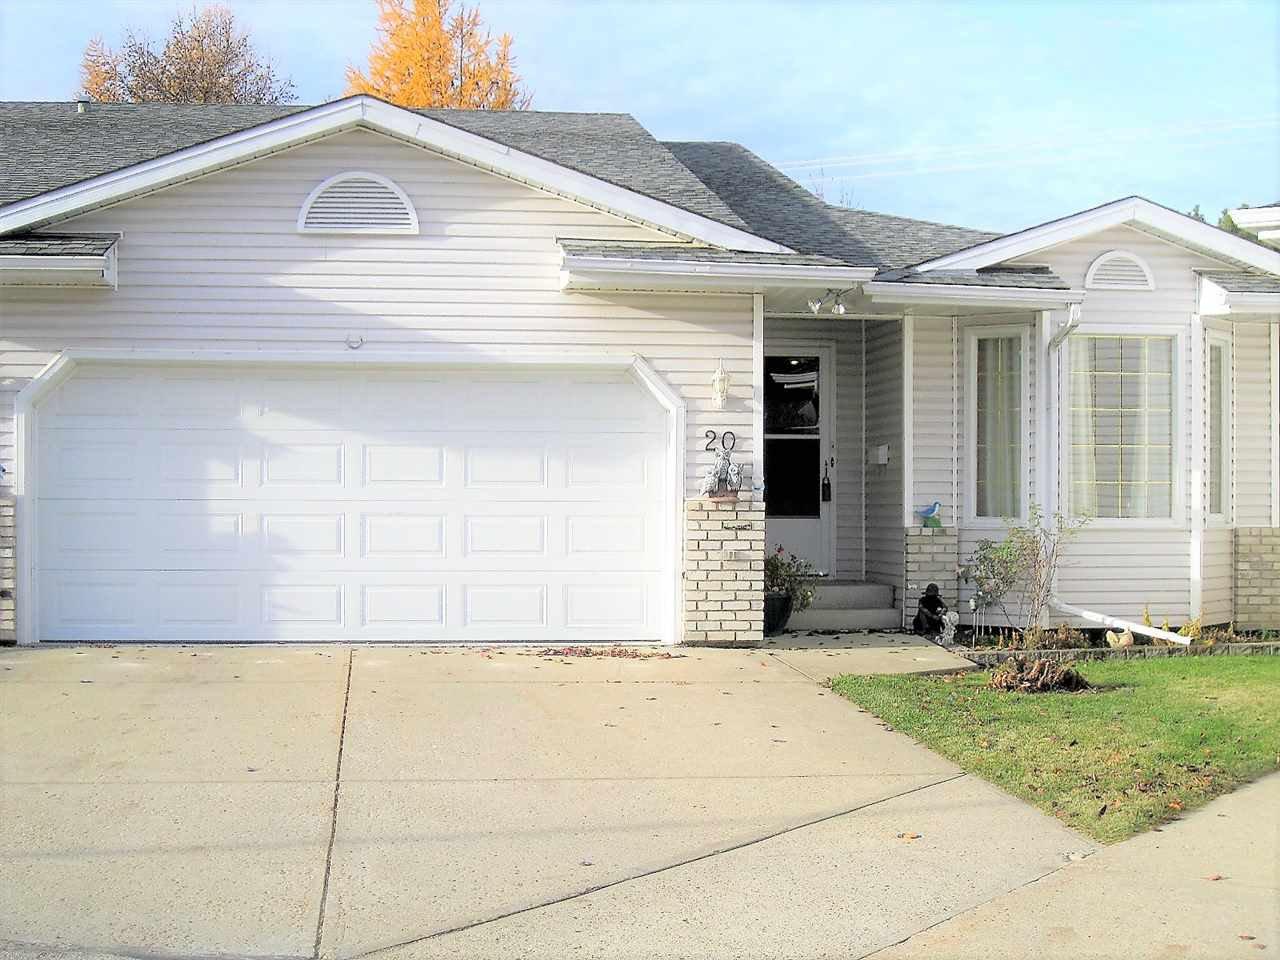 Main Photo: 20 2A FIELDSTONE Drive: Spruce Grove House Half Duplex for sale : MLS®# E4163940